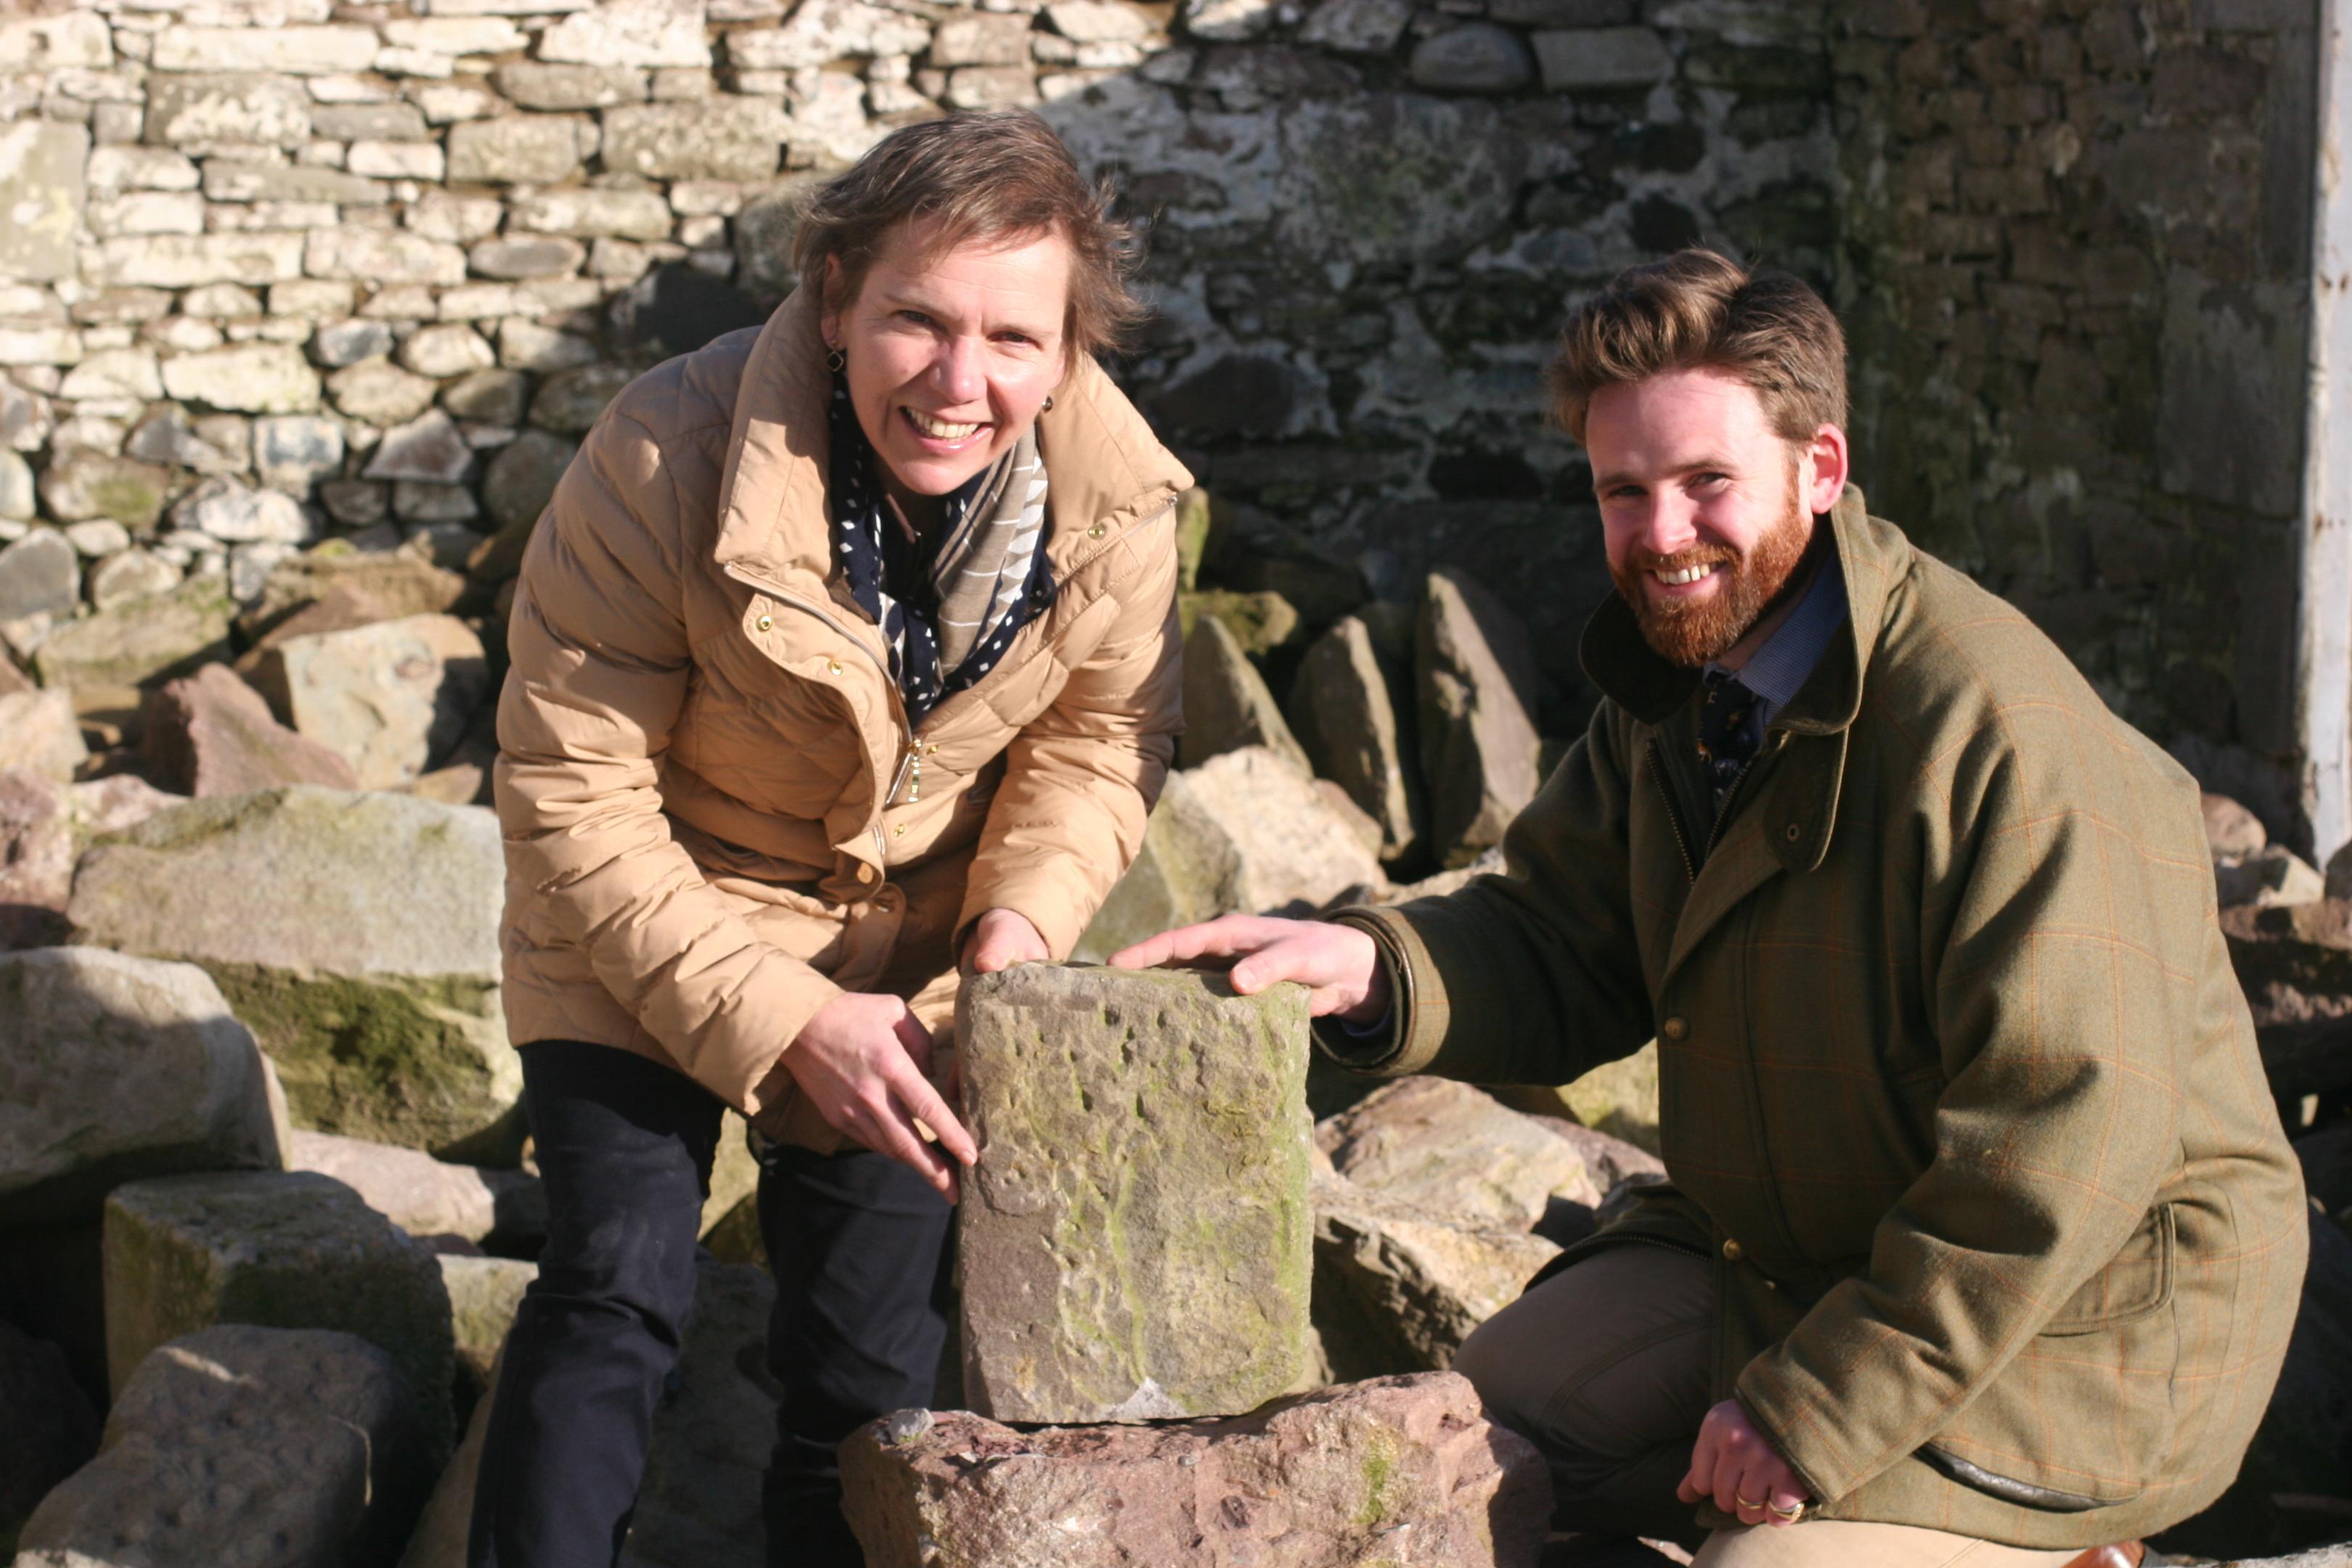 Hazel Peplinski and Chris Gordon (Scone Palace estate surveyor) source sandstone for the Stone of Destiny trophy.